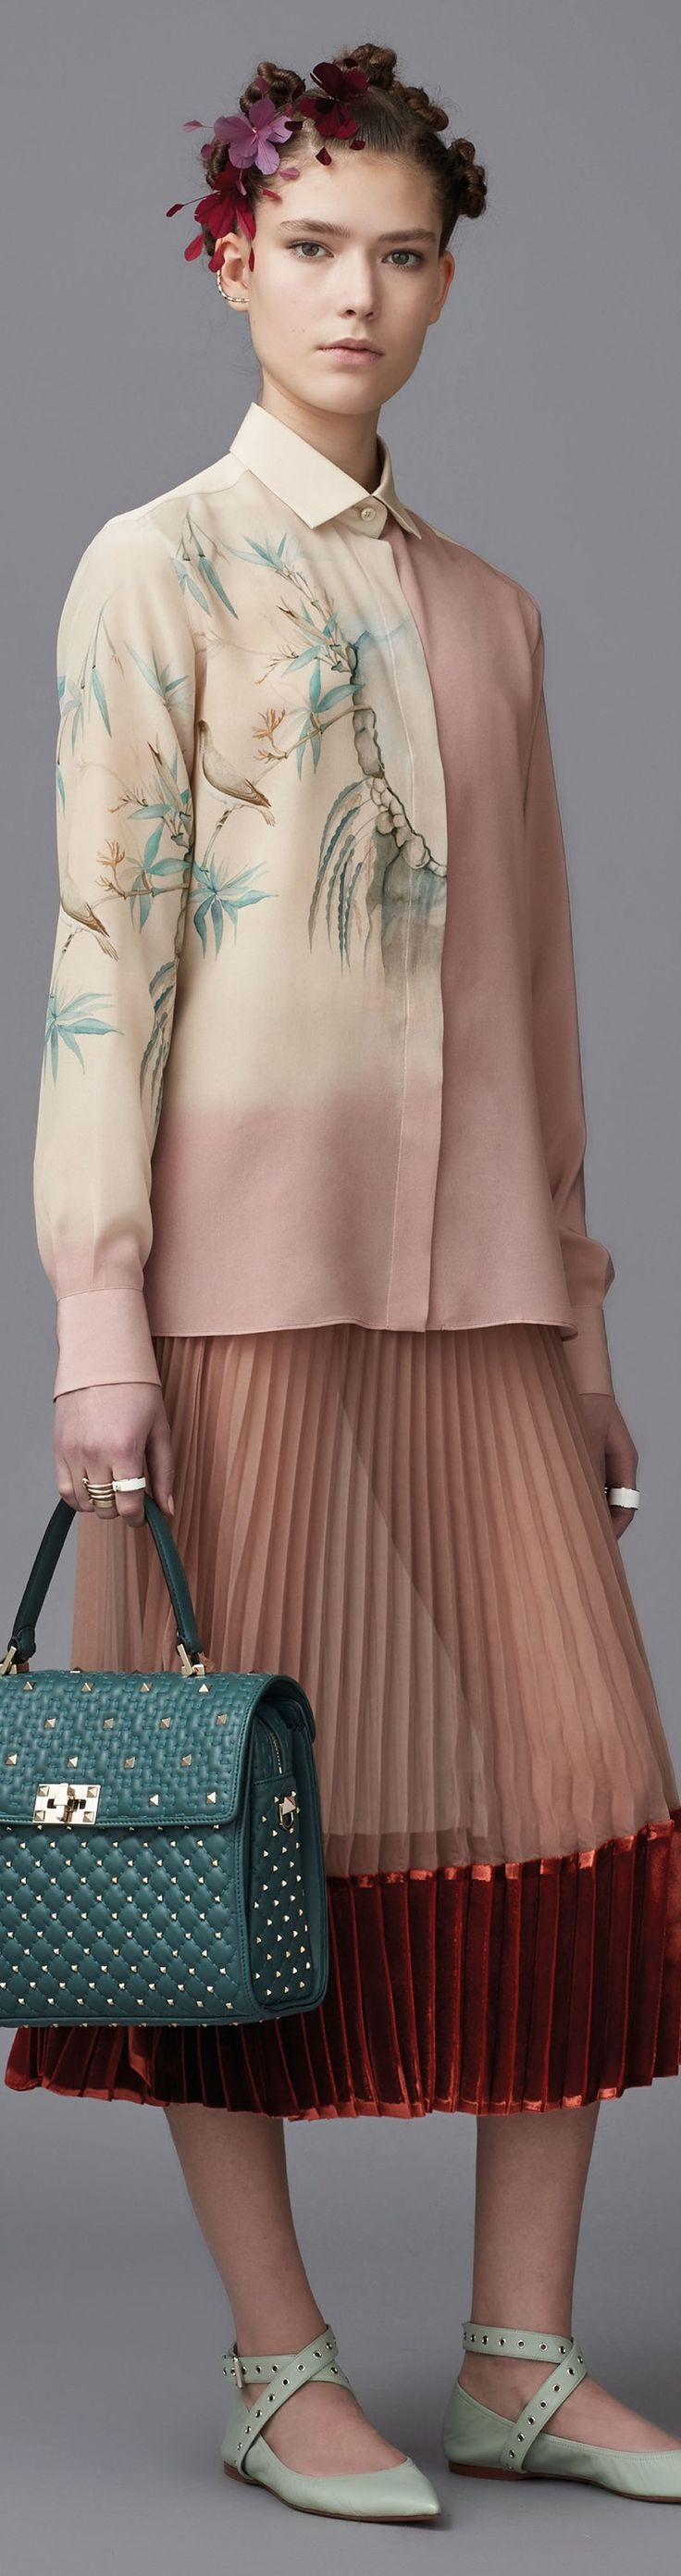 Valentino Pre Fall 2016 работа, девушка, рубеж, австралия, турция, сша, америка, граница http://escort-journal.com/